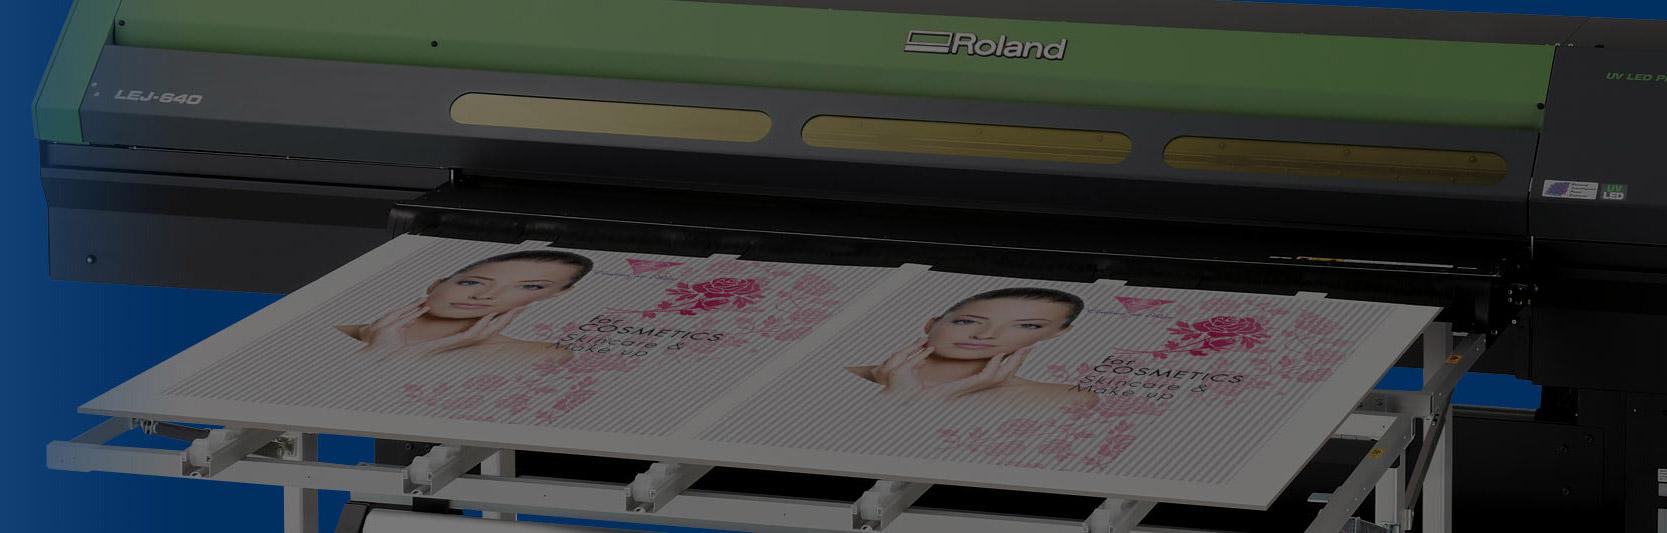 Roland versacamm vs300i ( free cost calculator ).